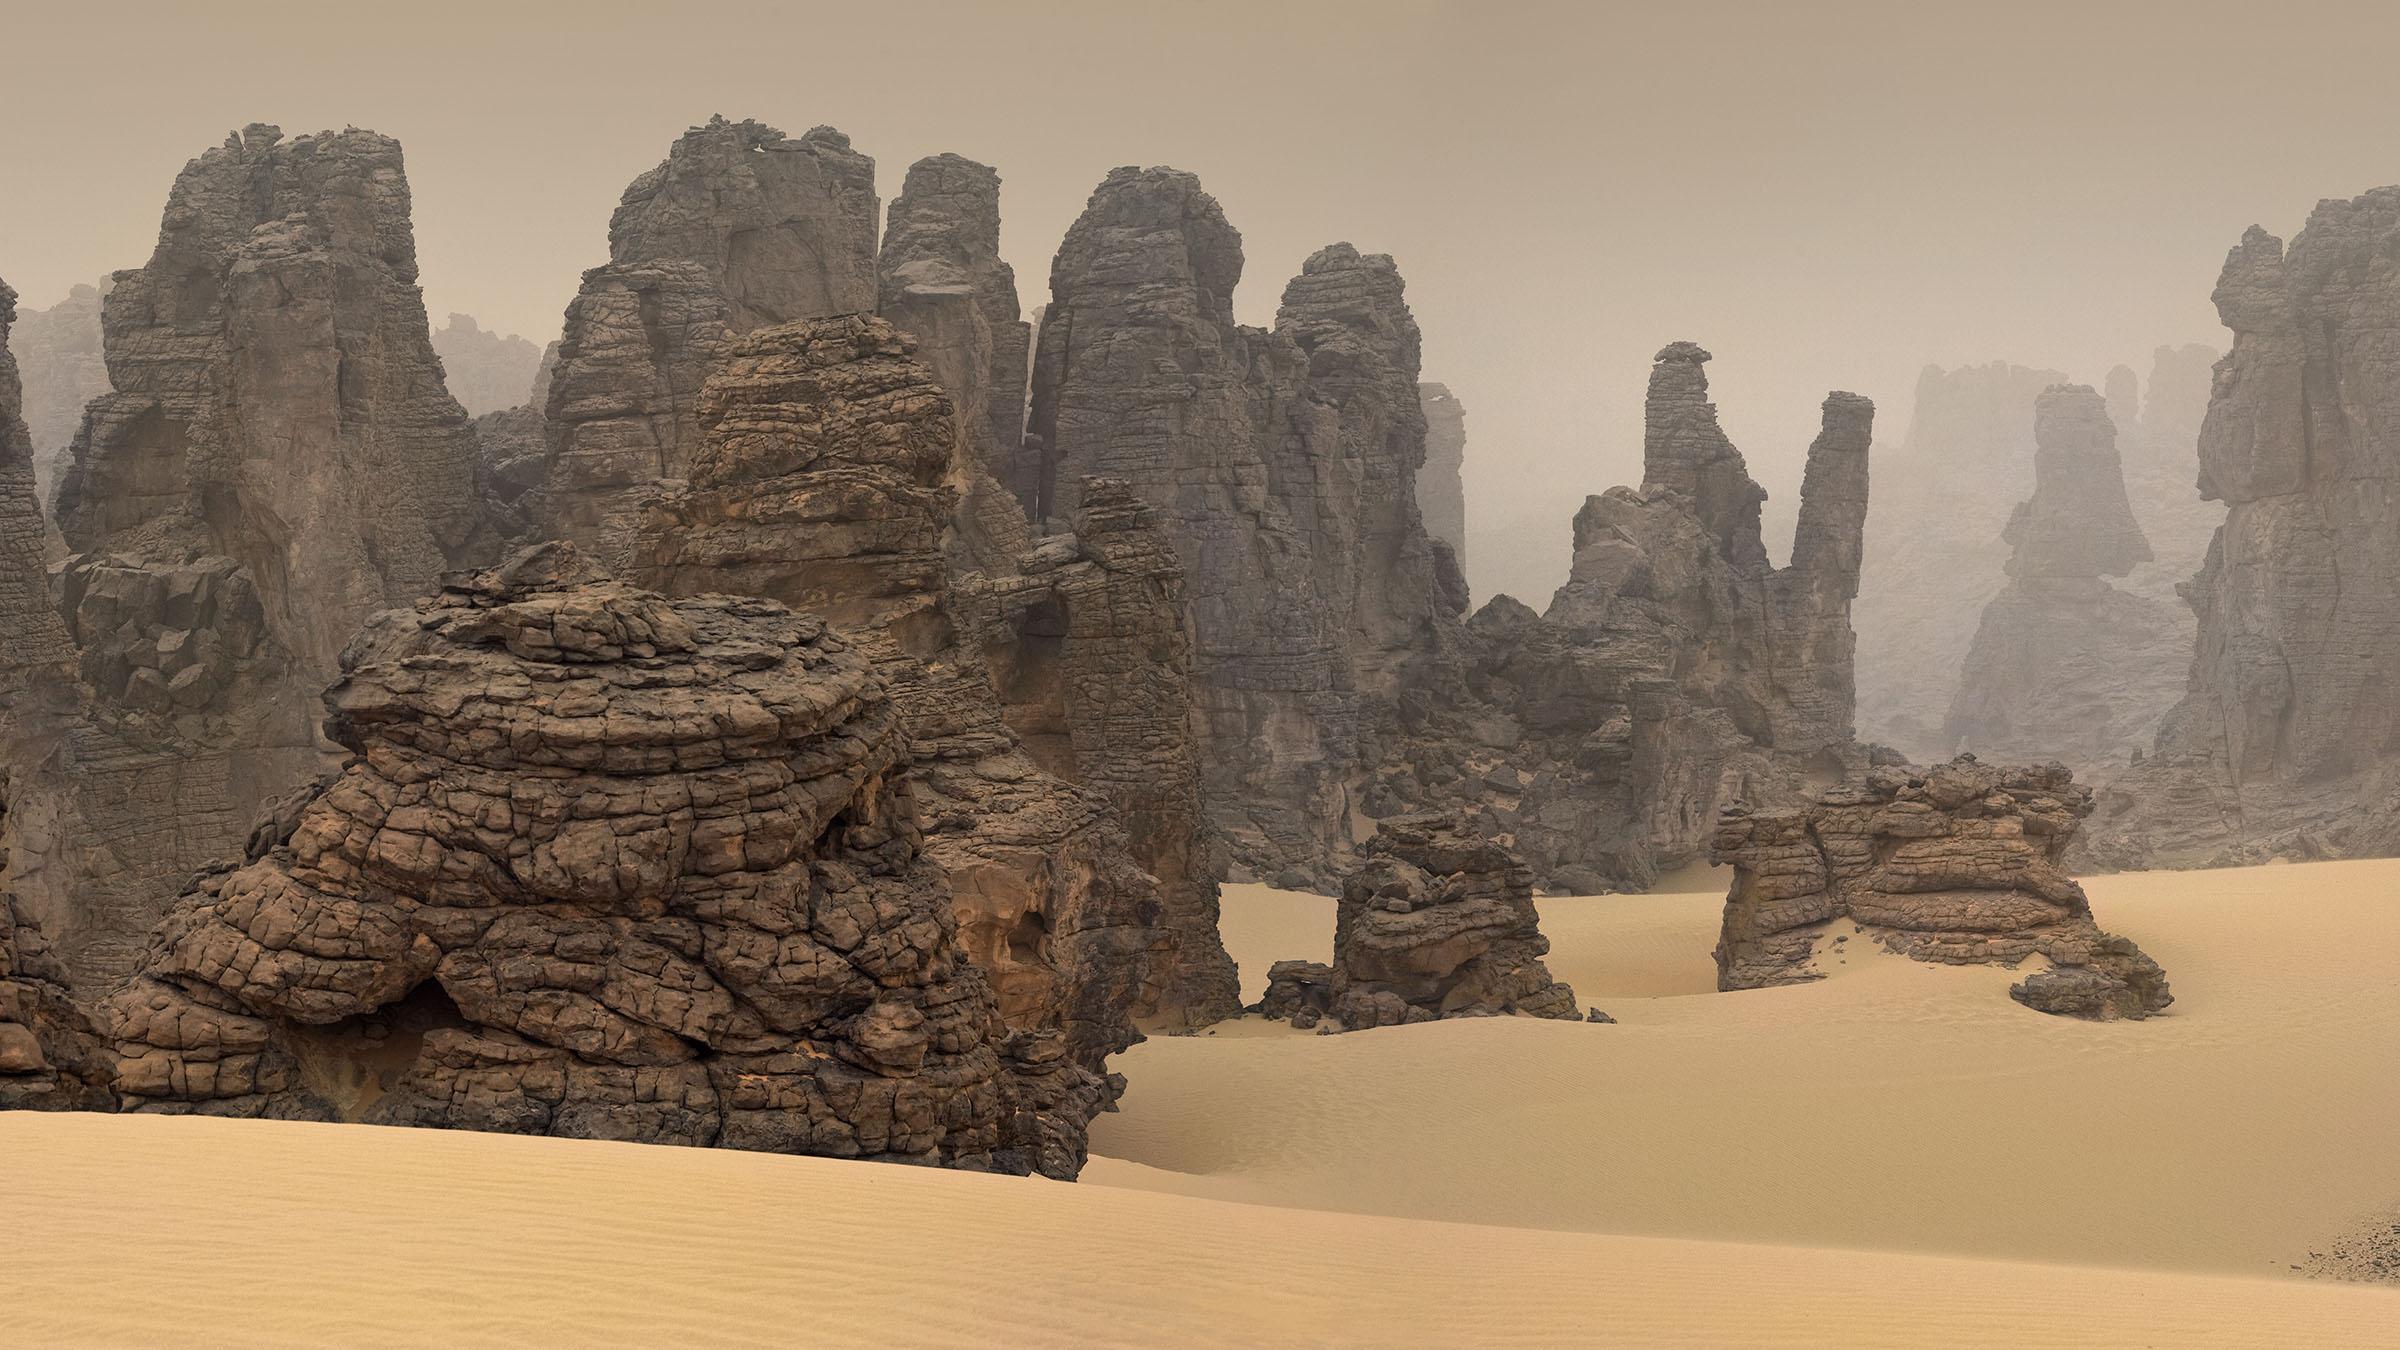 General 2400x1350 nature landscape desert sand rock Libya mist